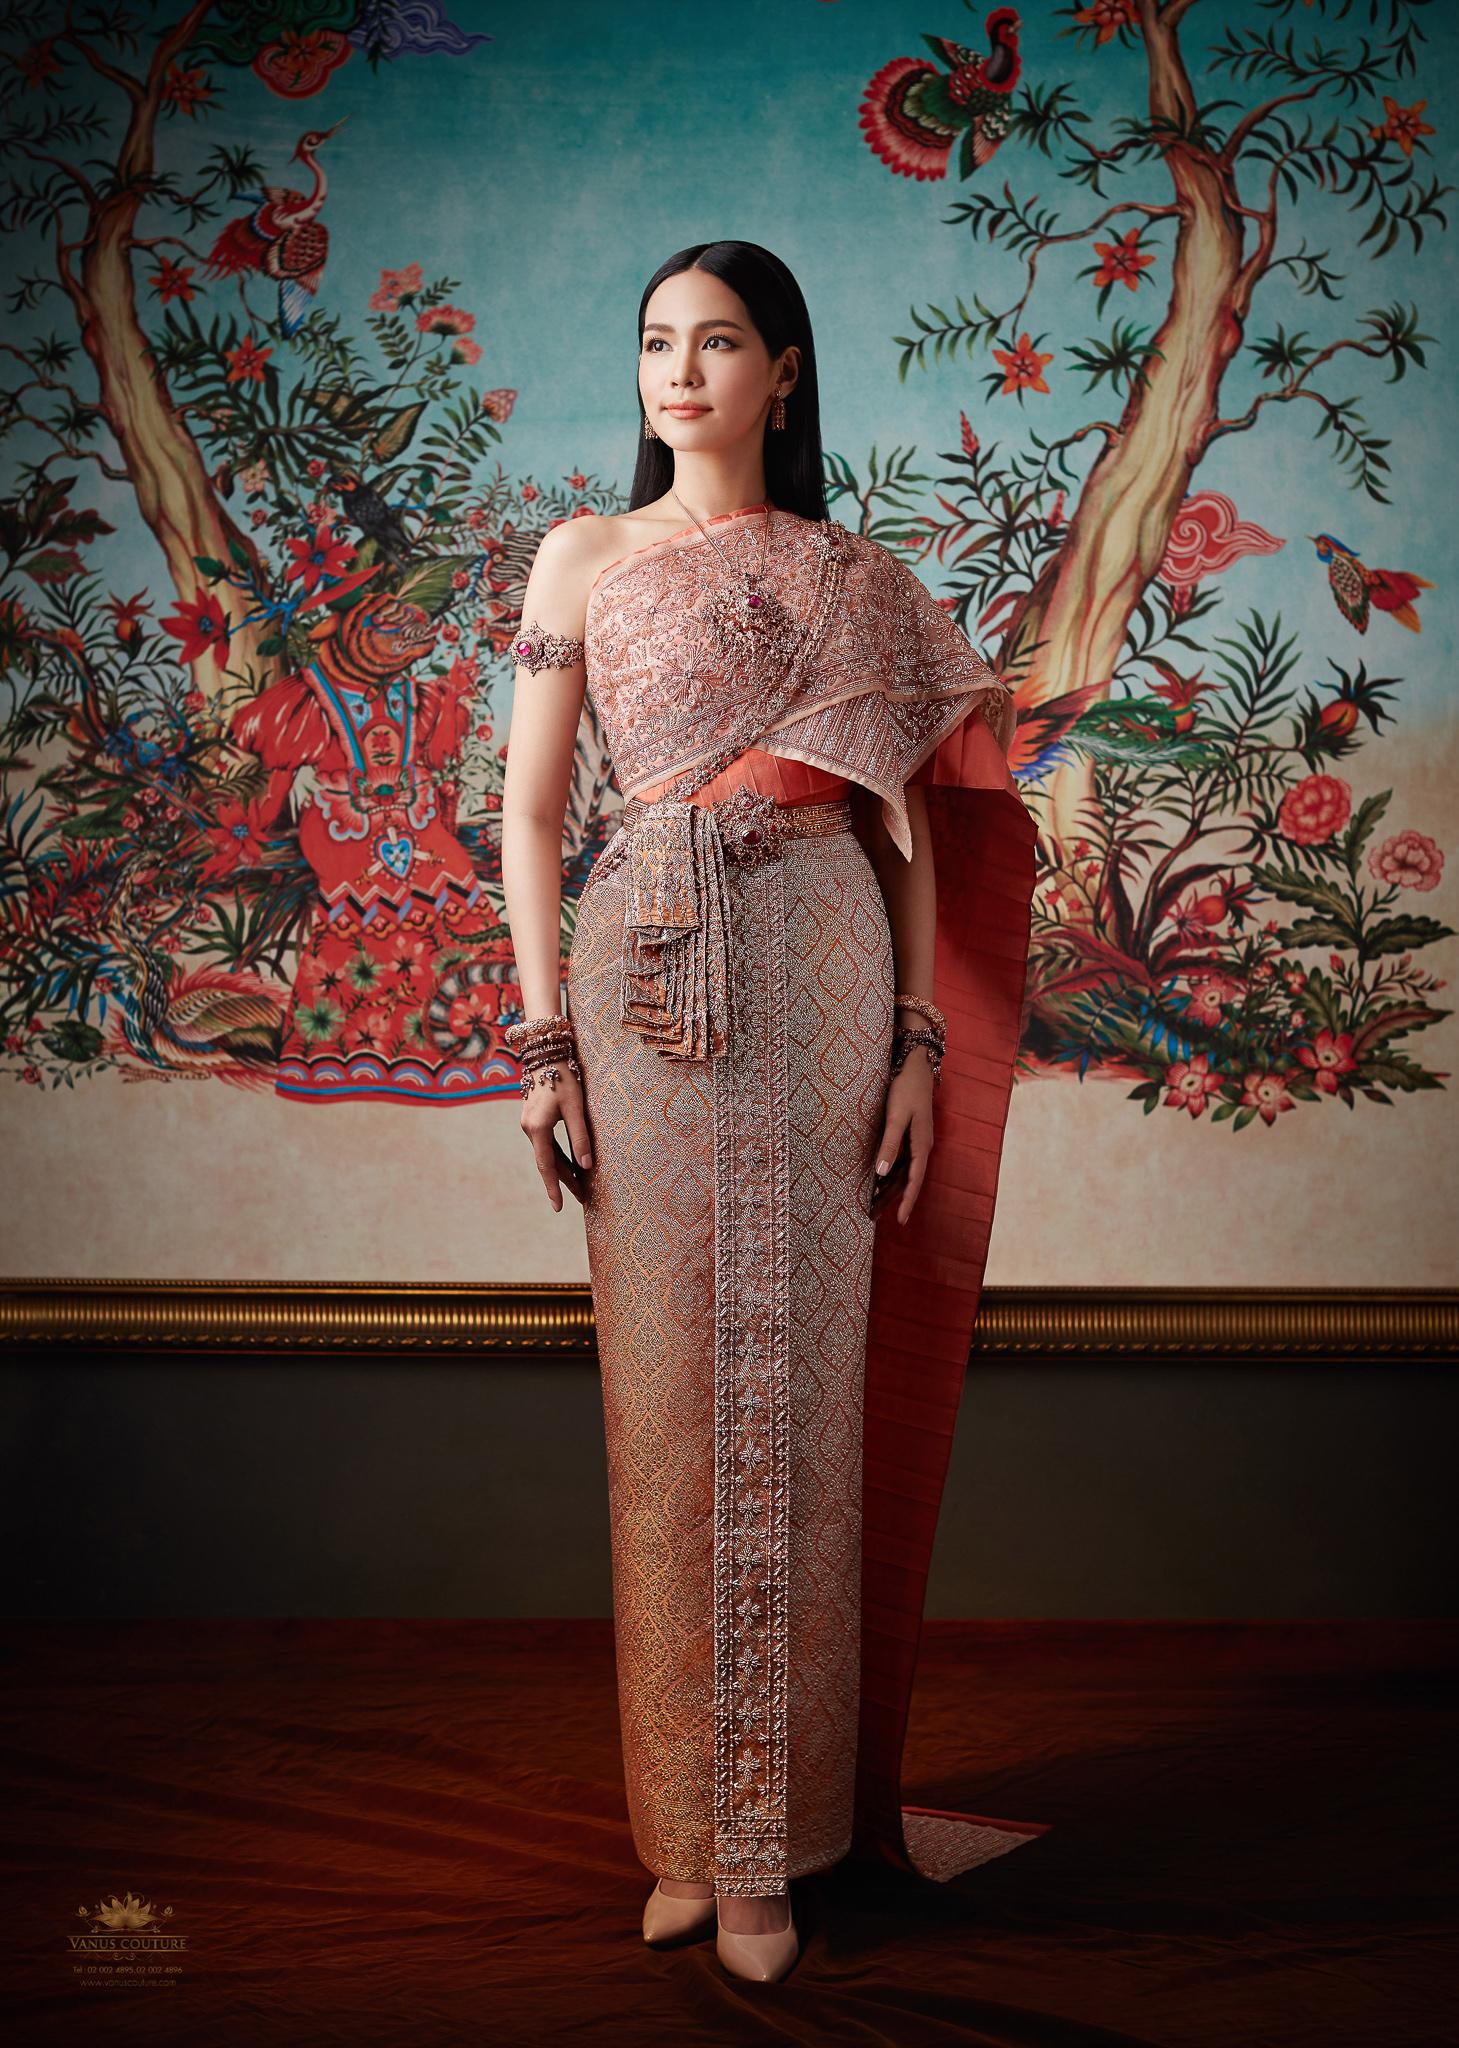 Thai traditional dress - Bint 03